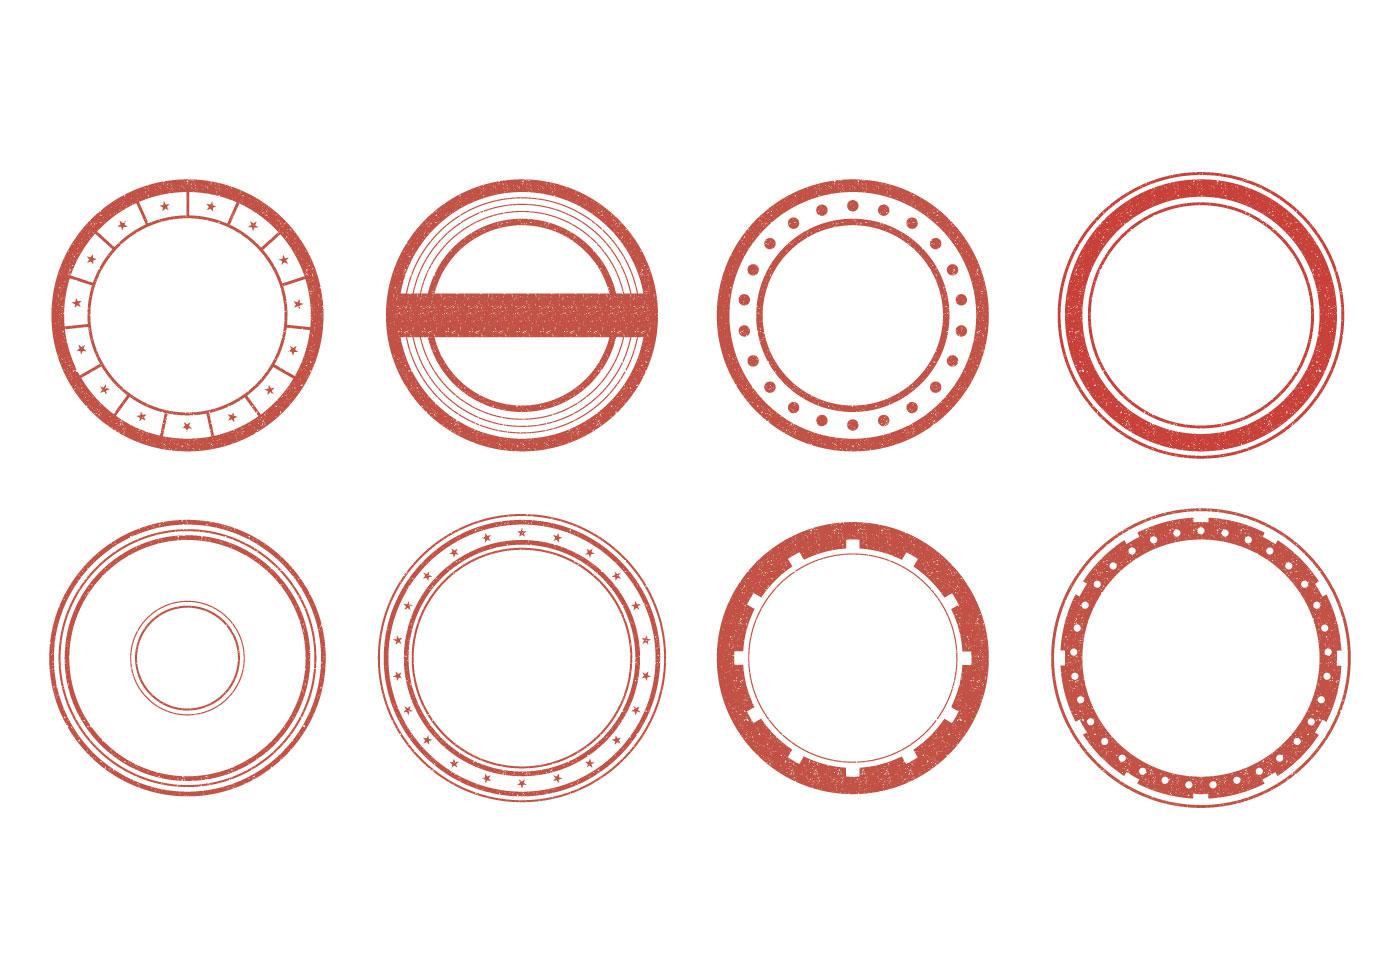 Cute Circle Wallpaper Stempel Vector Download Free Vector Art Stock Graphics